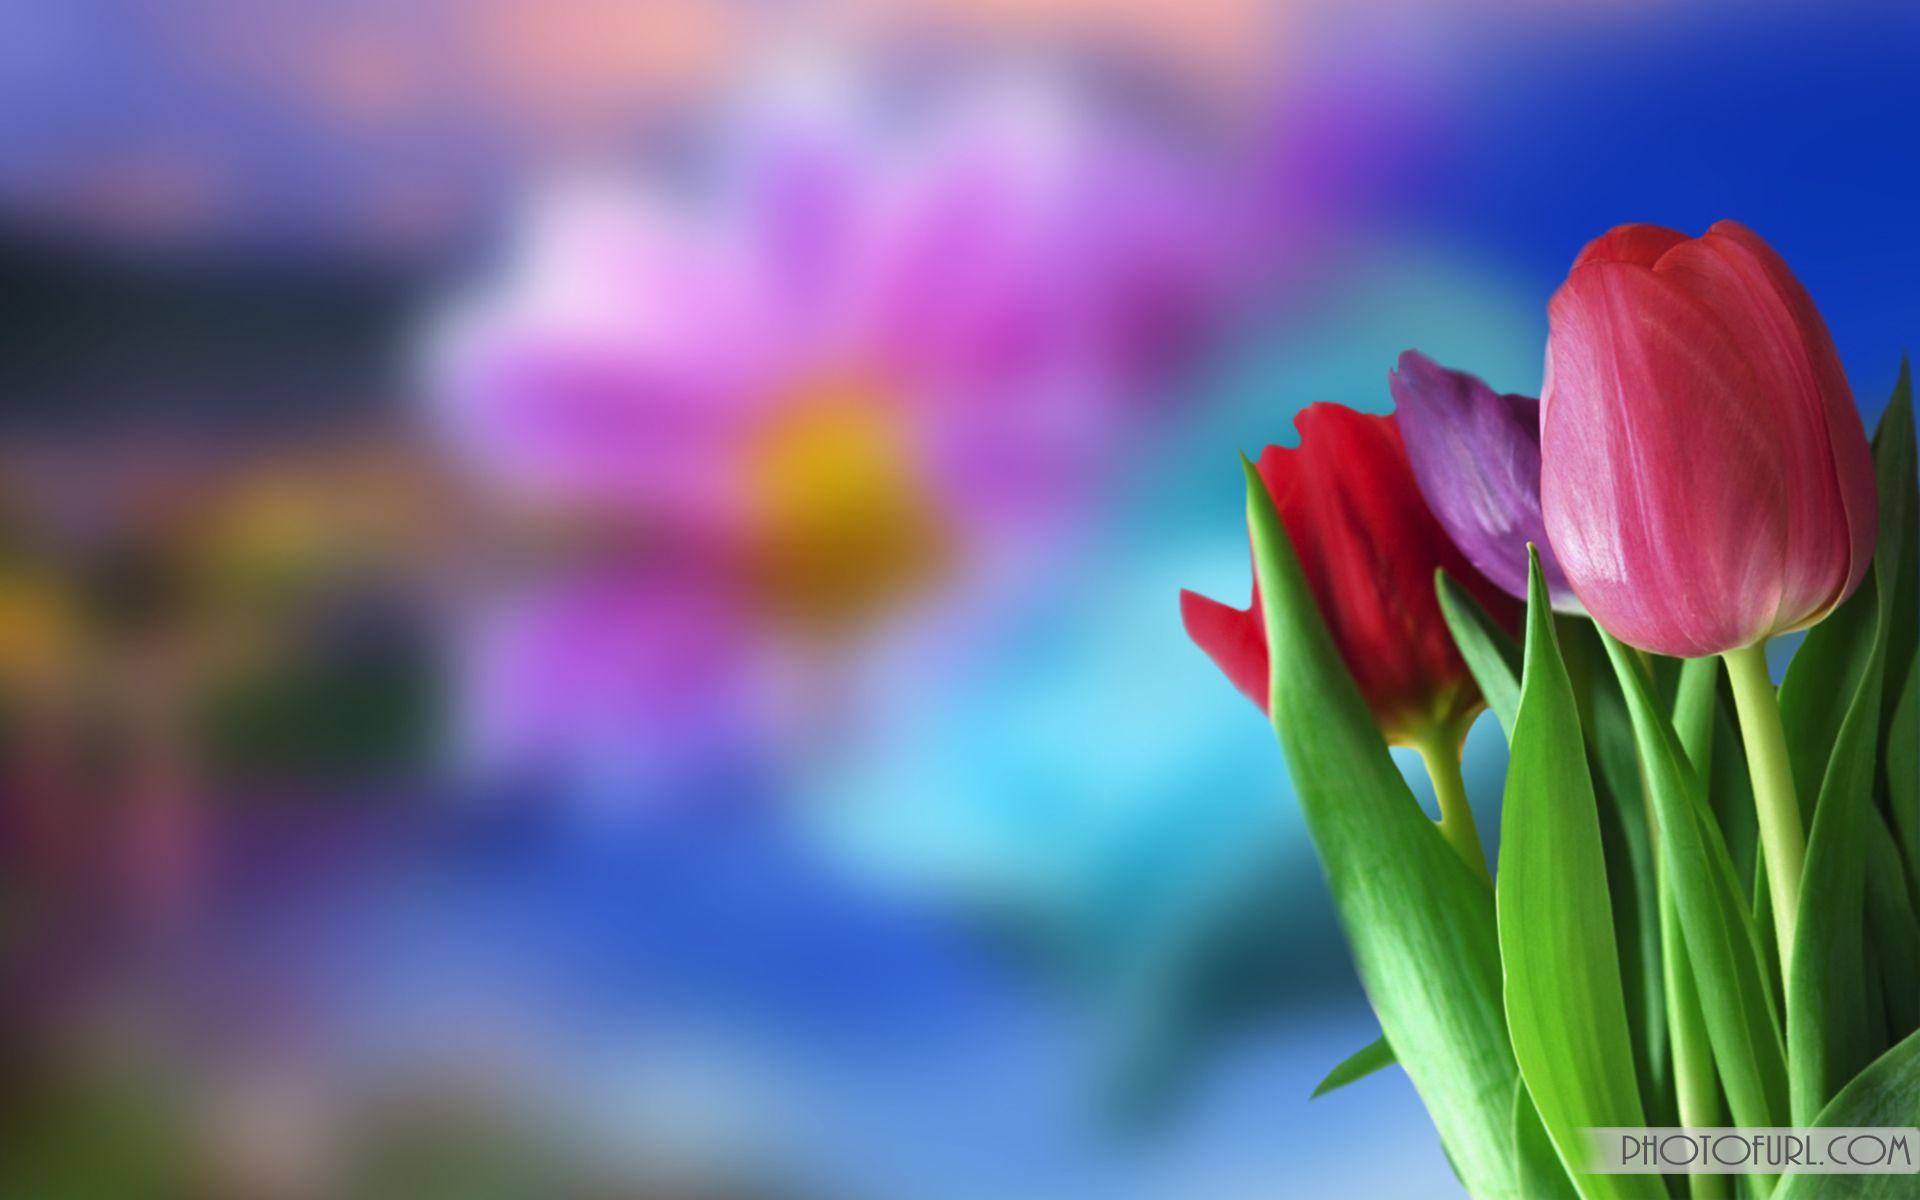 Animated Flowers Beautifull Backgrounds Httpwallawy